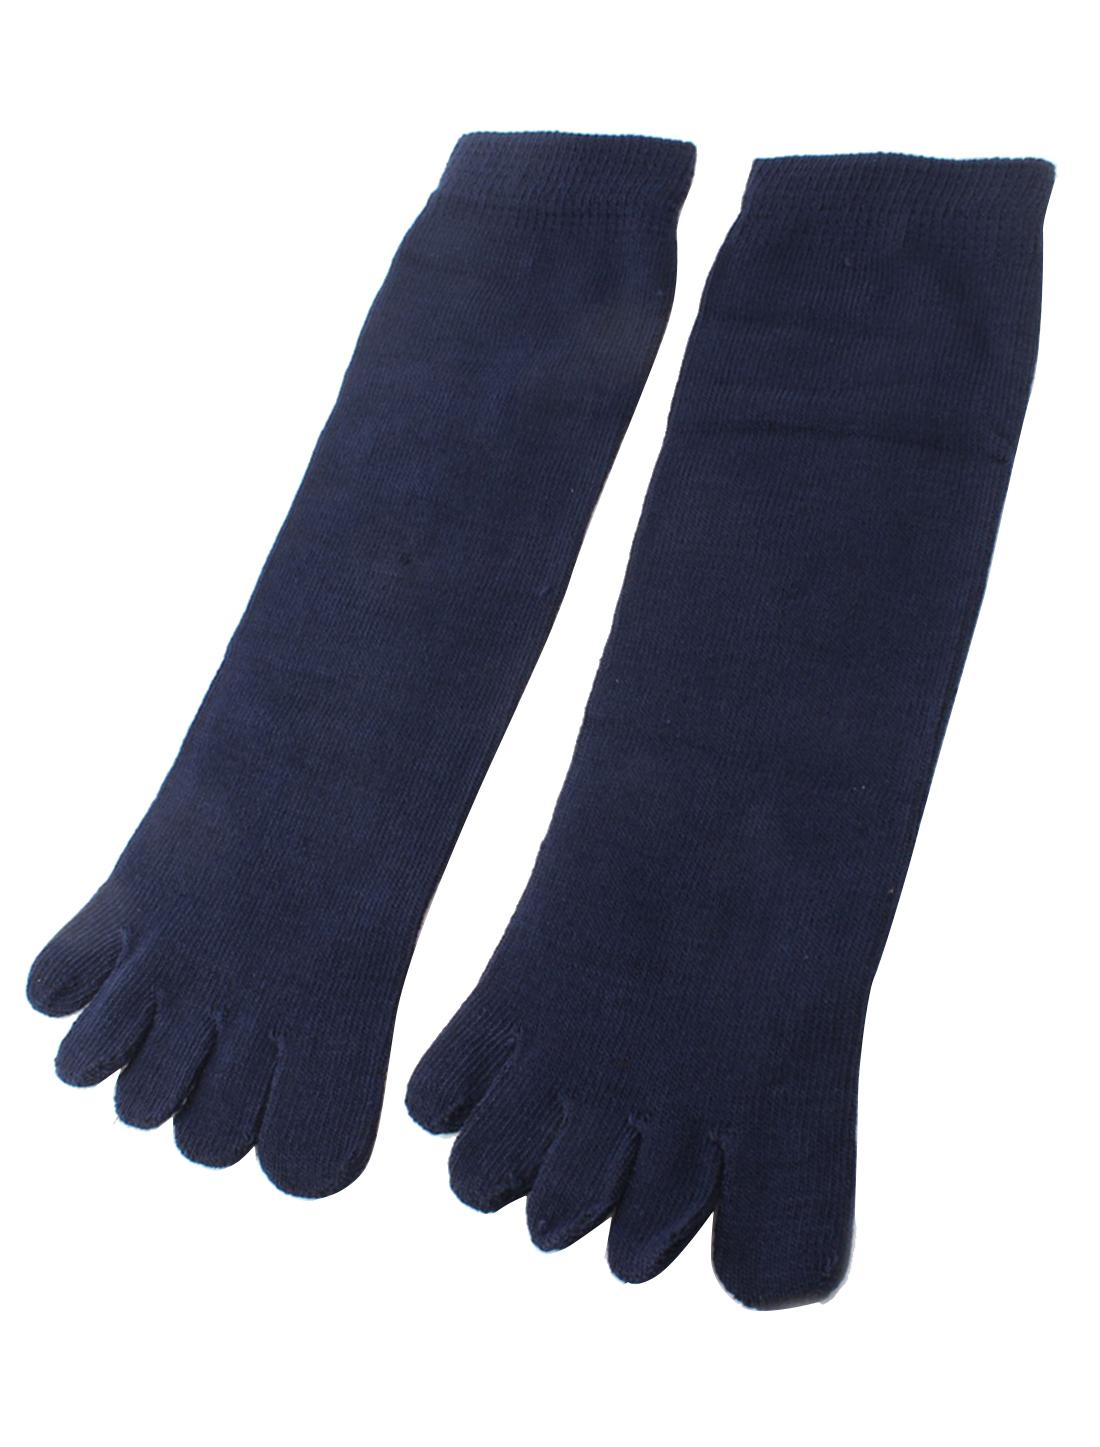 Navy Blue Five Separte Fingers Cutton Blends Toe Socks Pair for Ladies Men